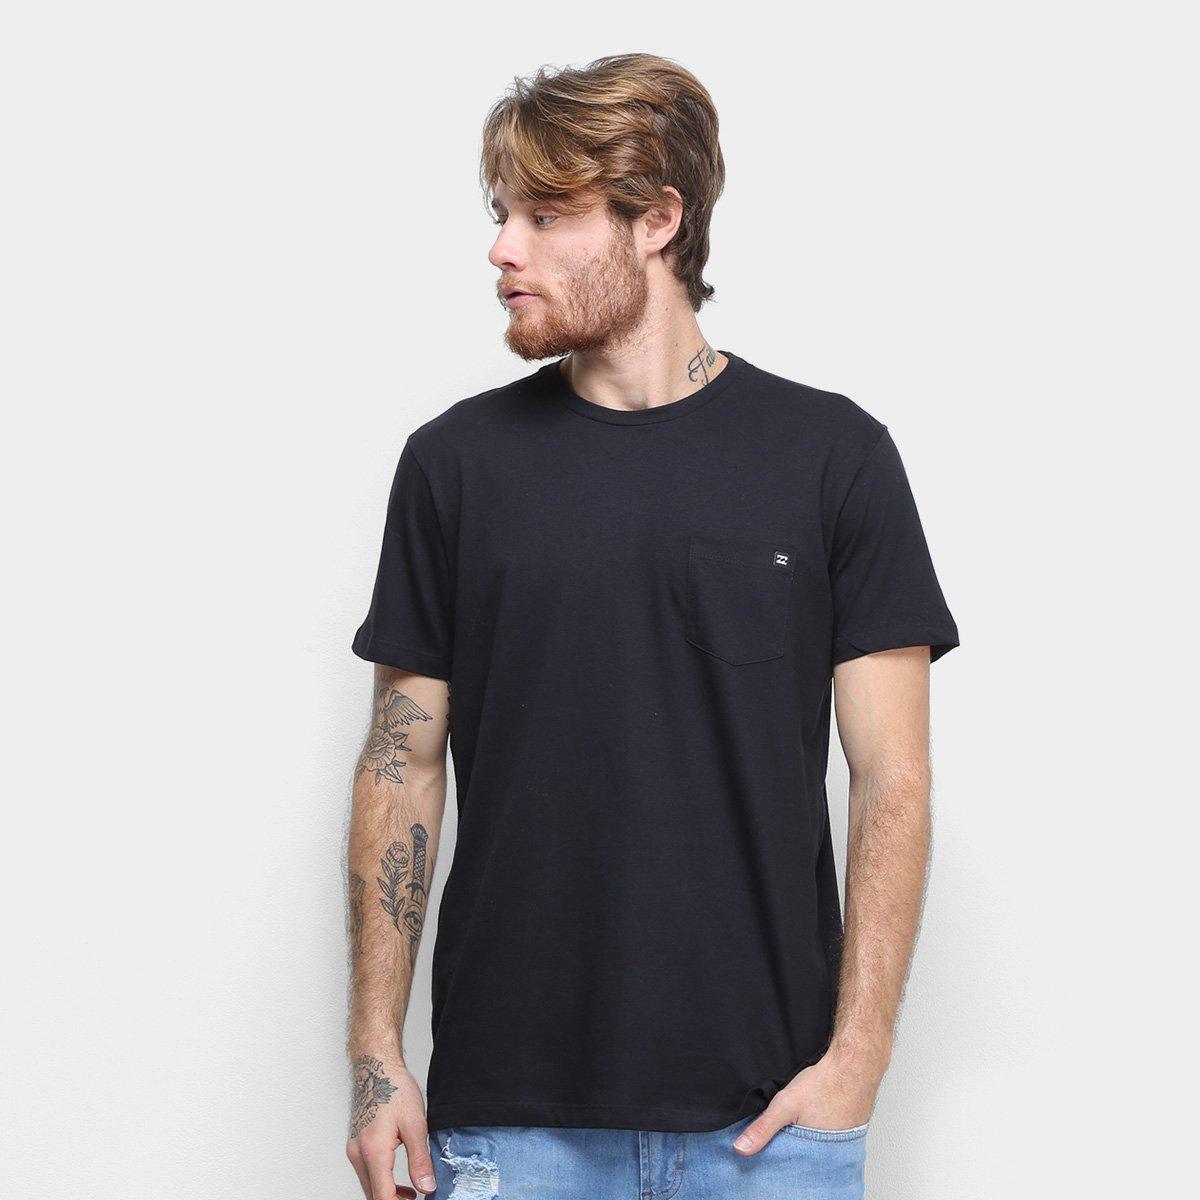 Camiseta Billabong Simple Basic Masculina